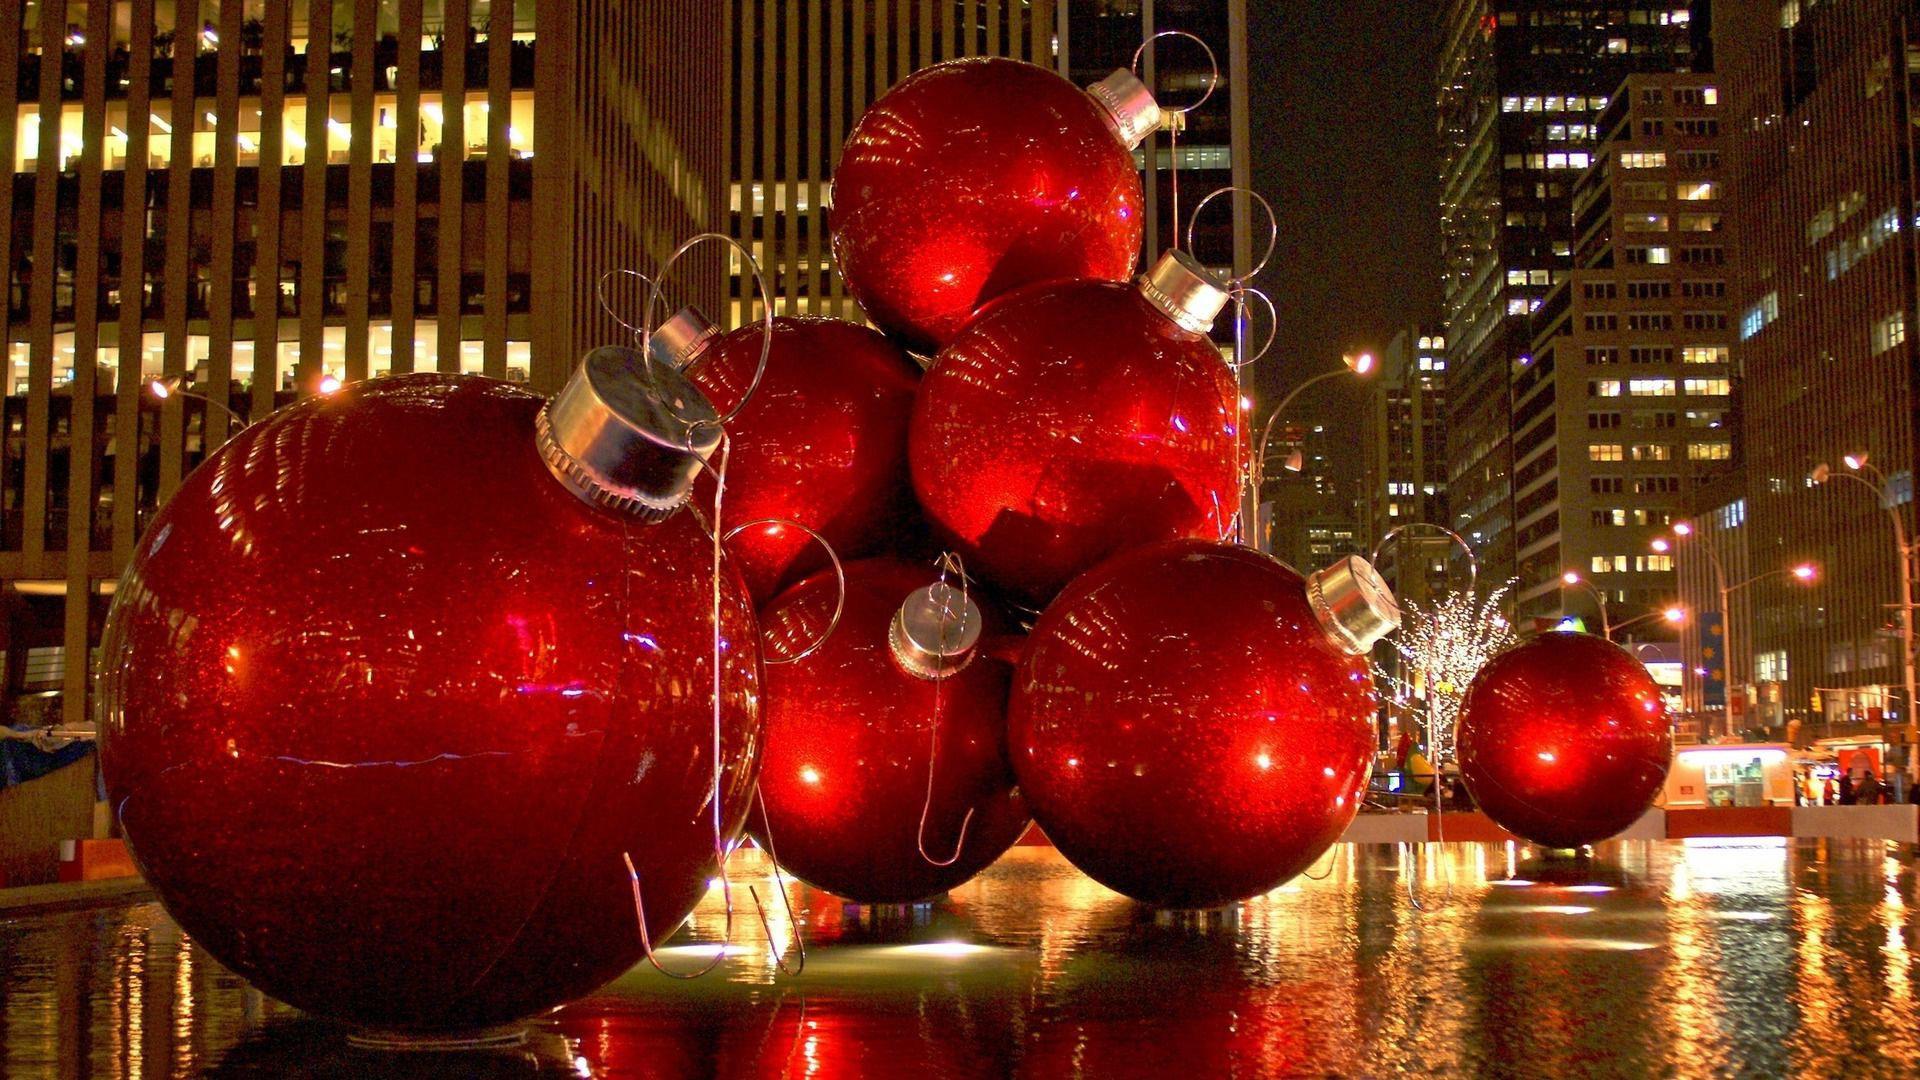 New York Christmas Wallpaper 1920x1080